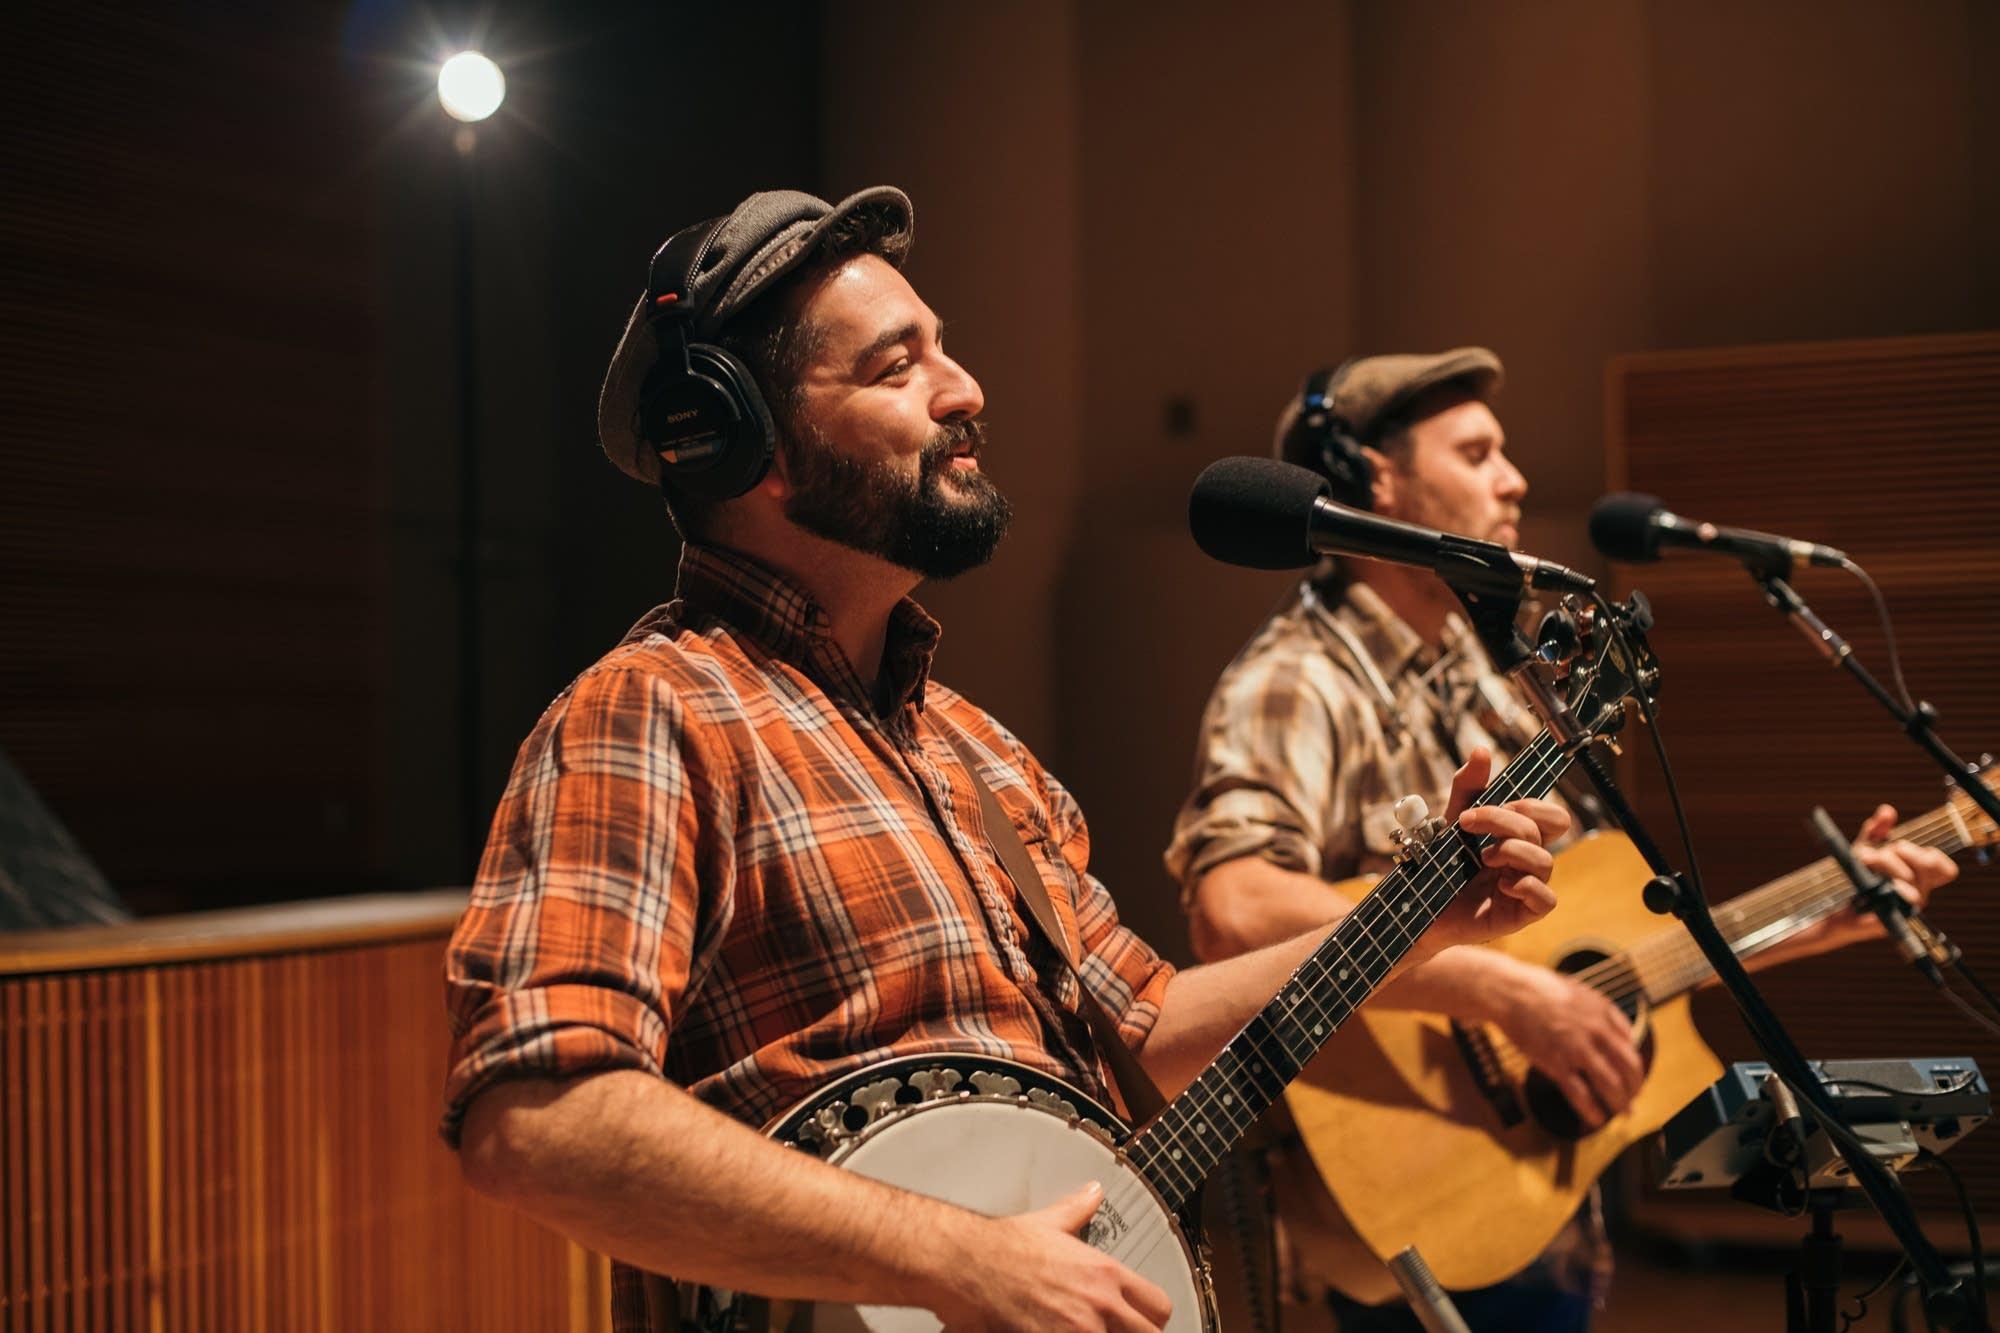 The Okee Dokee Brothers perform at Radio Heartland